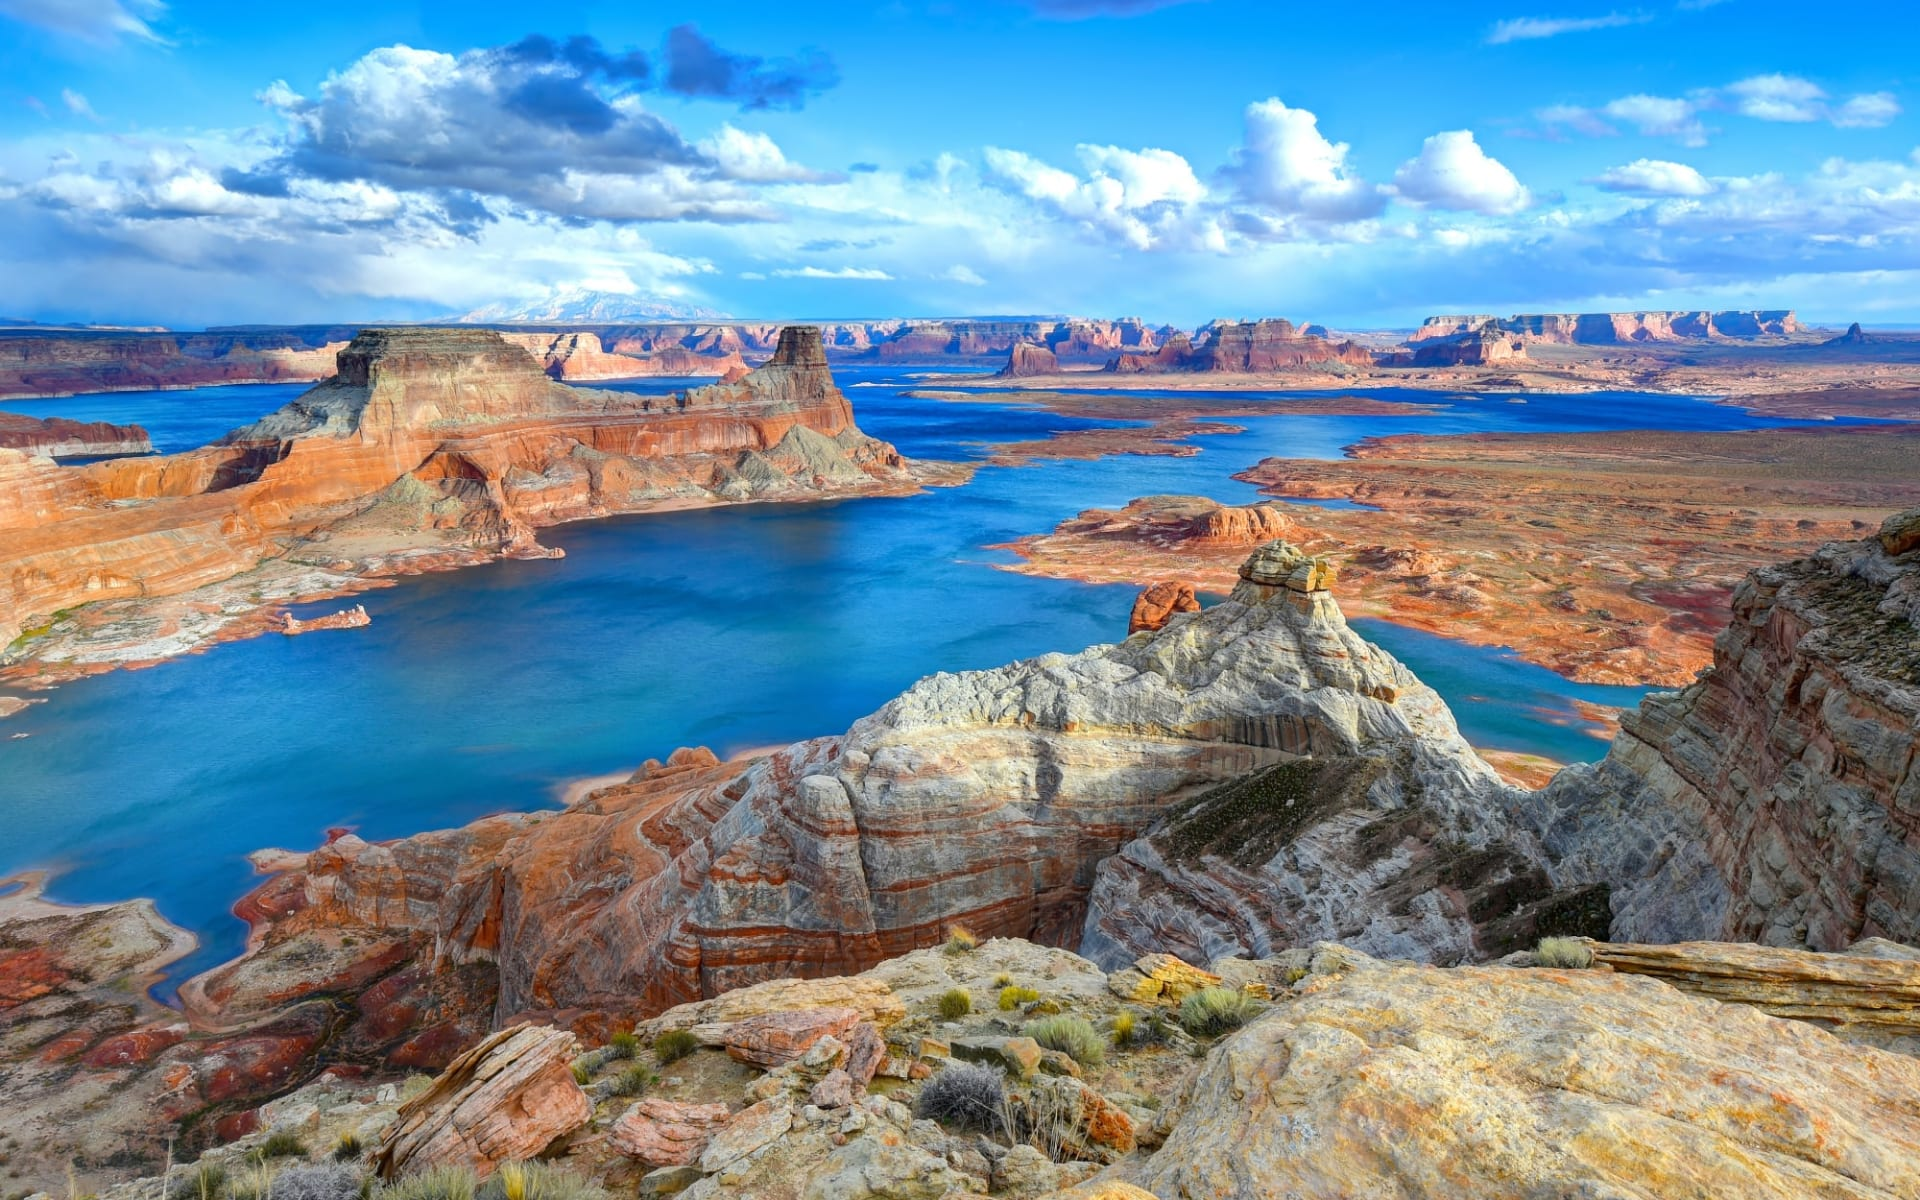 Entdecker-Reise Südwesten ab Las Vegas: USA - Arizona - Lake Powell Panorama